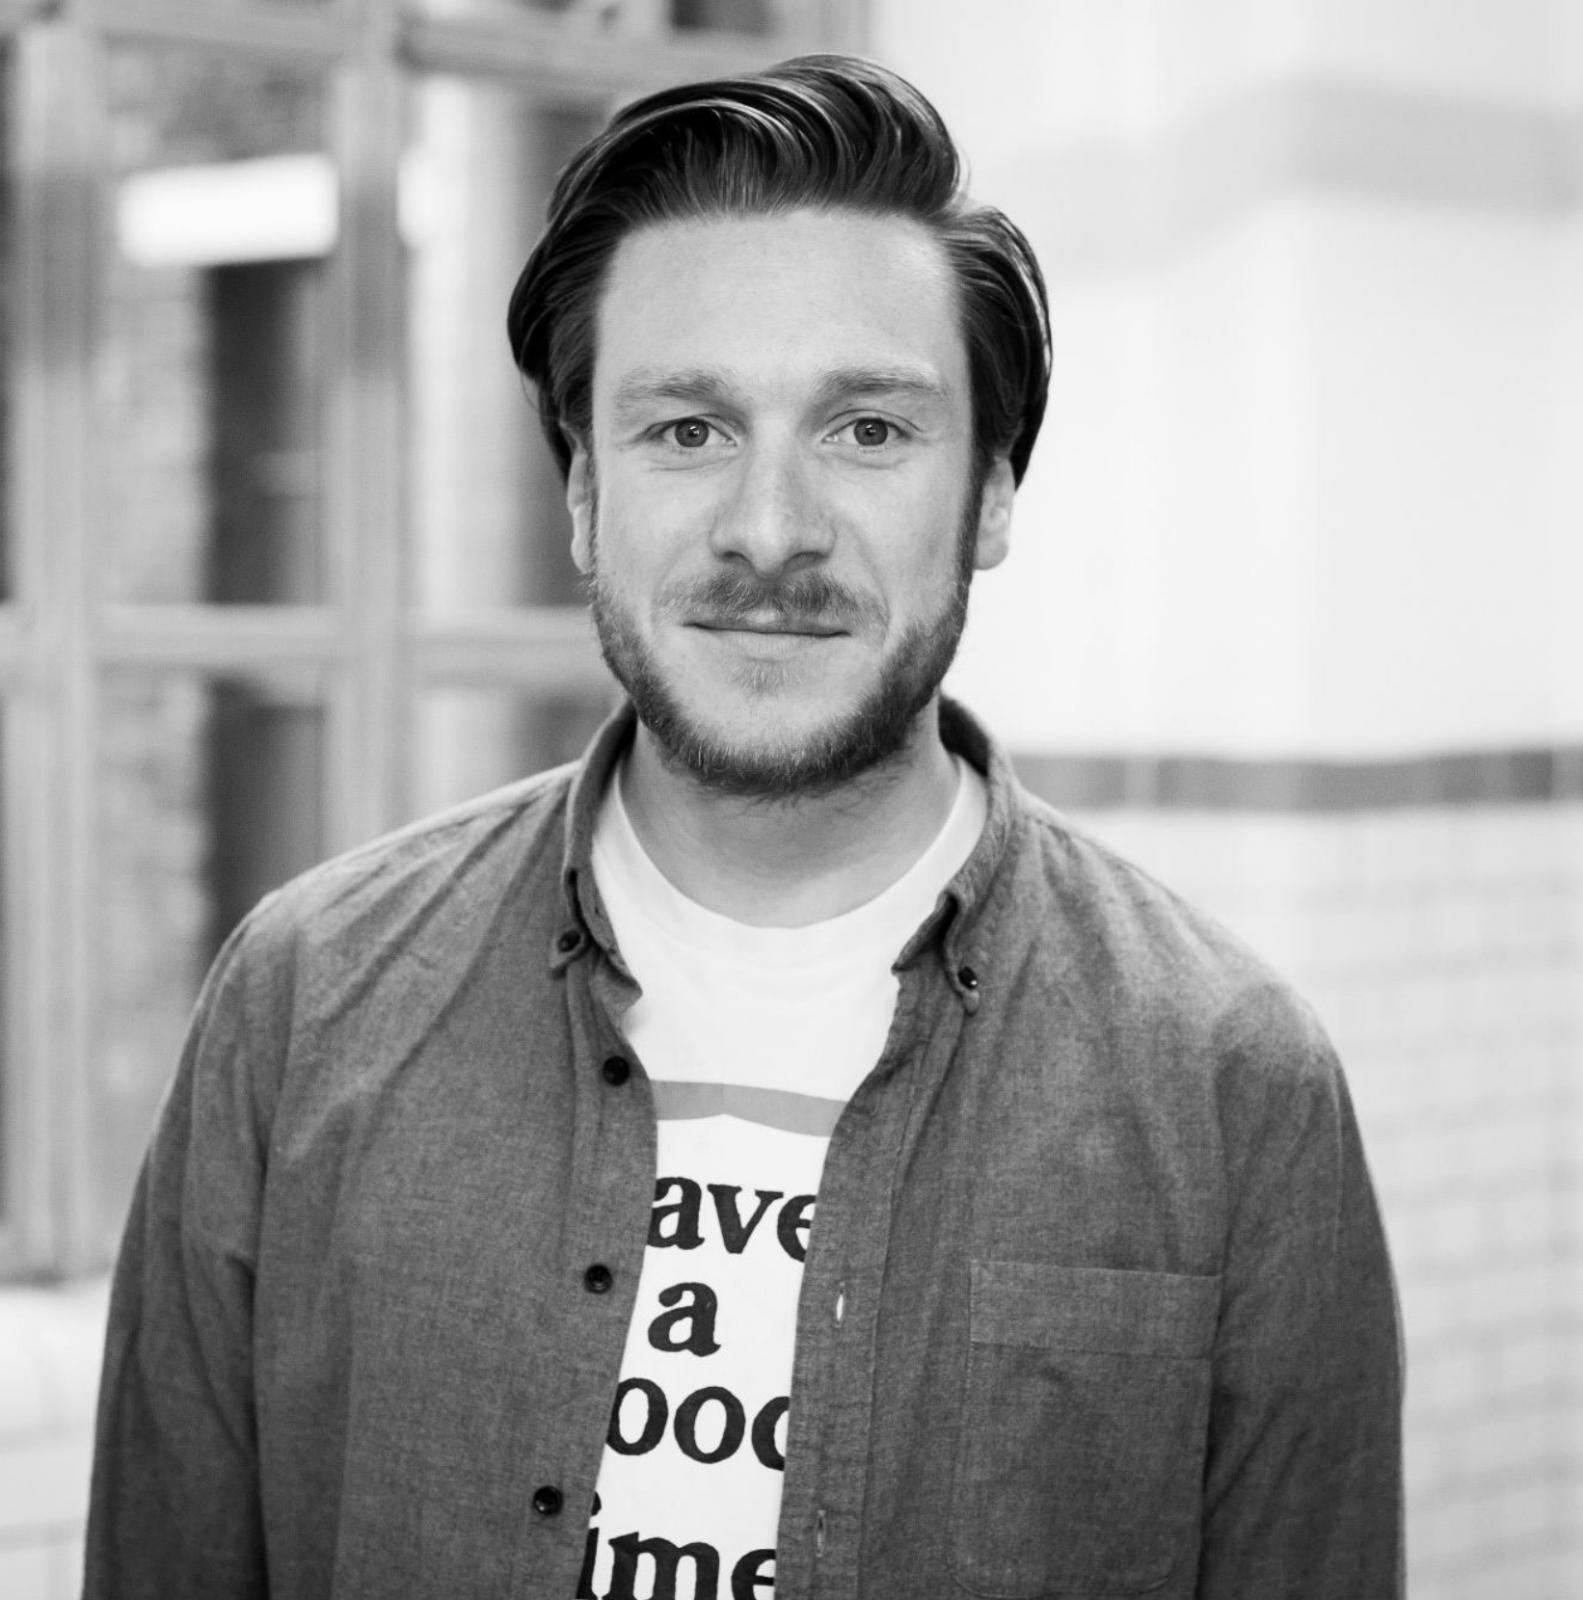 A headshot of Ben Harwood - creative director at Feed agency